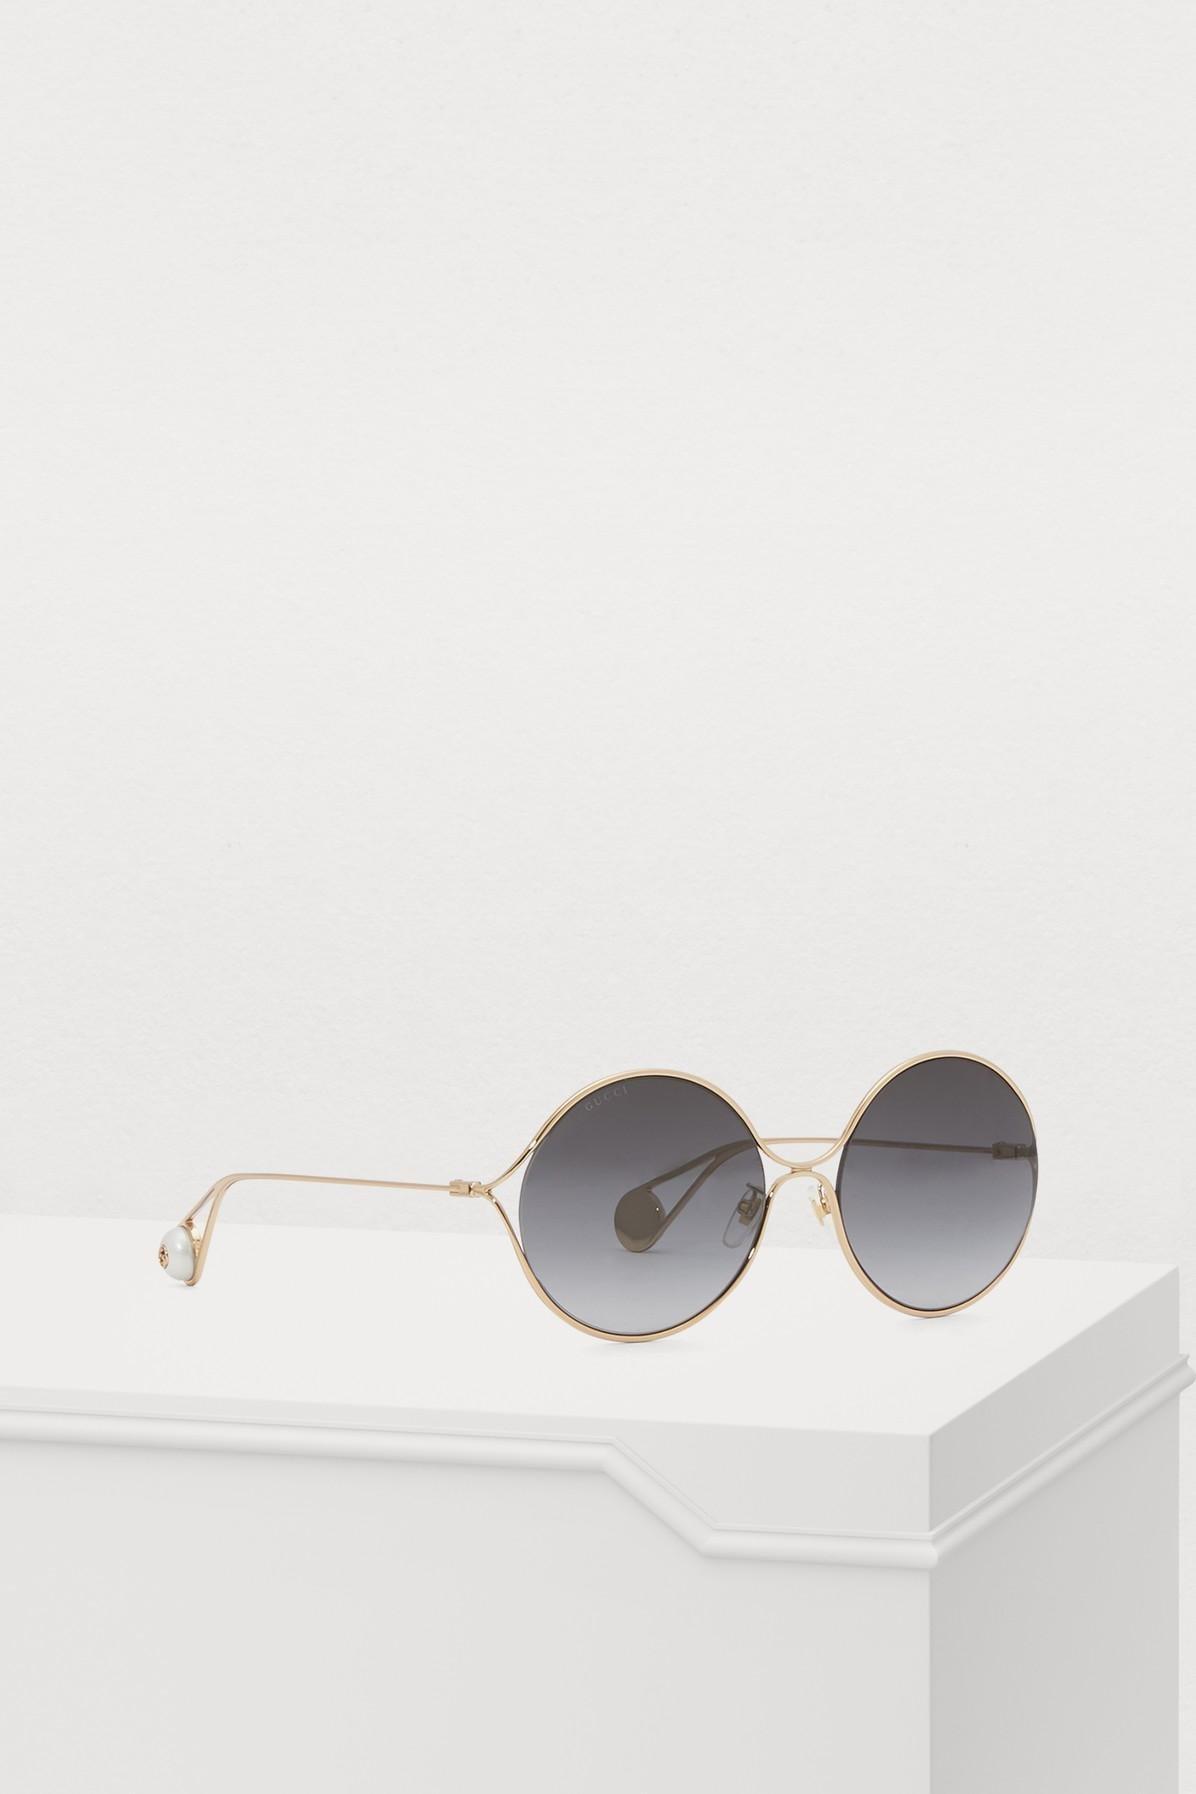 b300d9bd557 Gucci - Multicolor Round-frame Metal Sunglasses - Lyst. View fullscreen